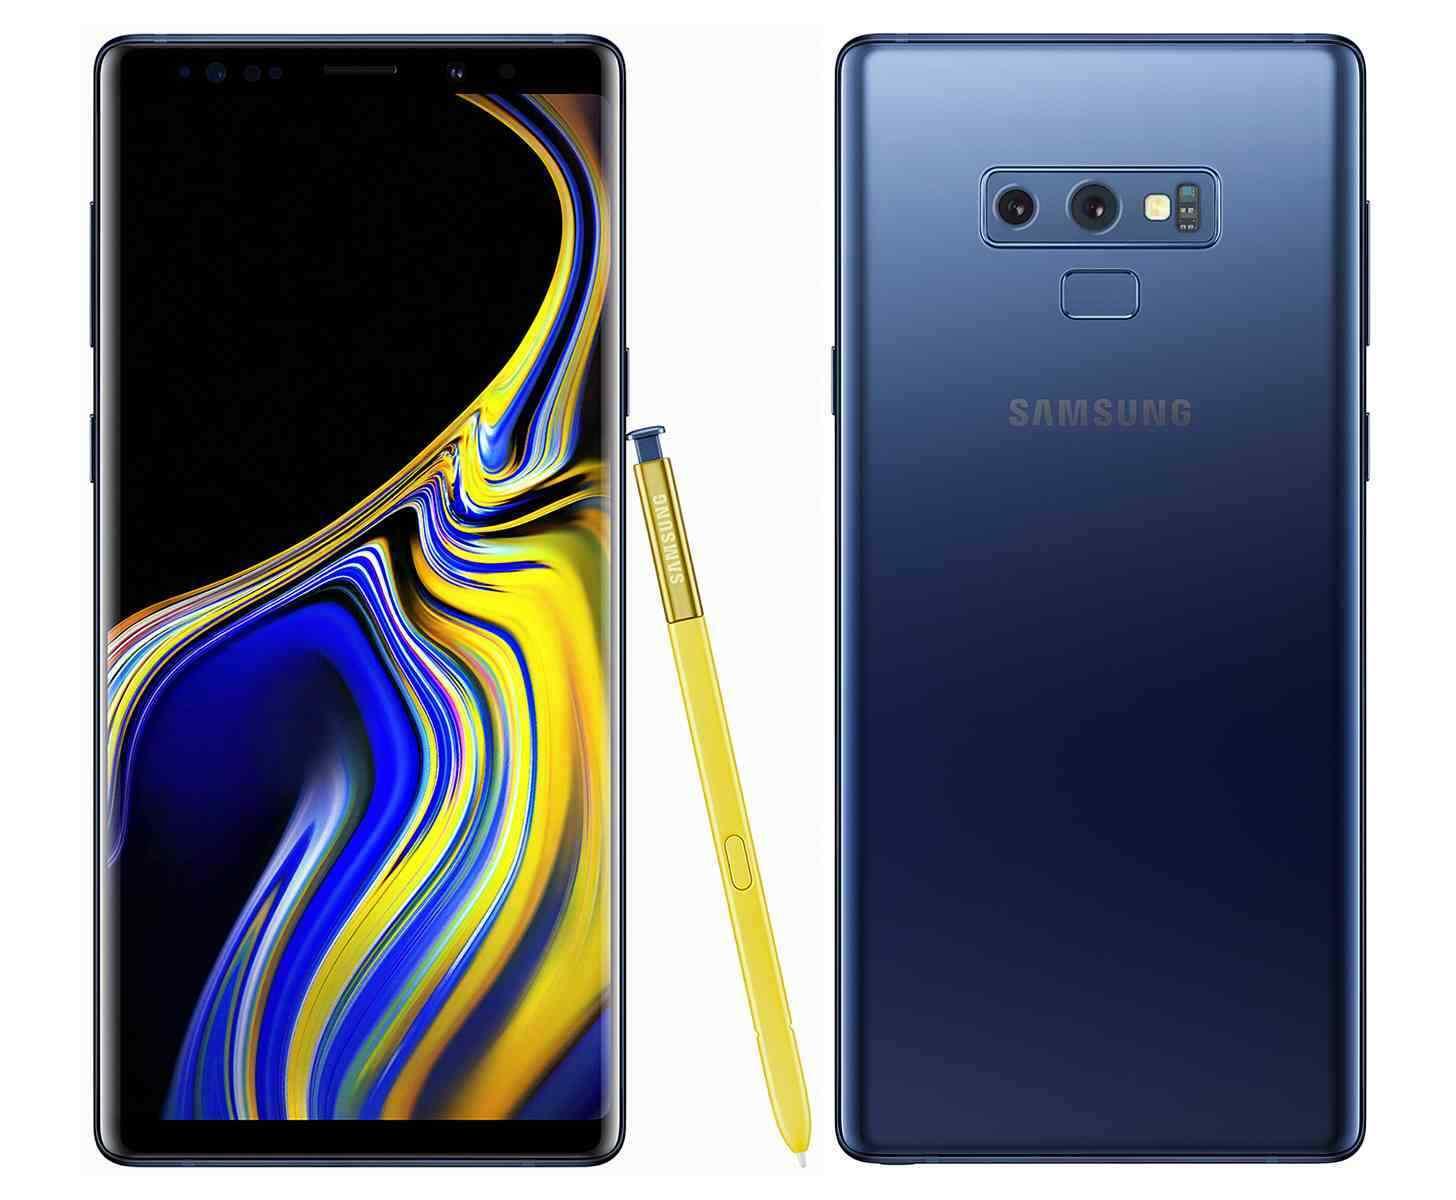 Samsung Galaxy Note 9 SM-N960U 128GB Verizon & GSM Unlocked Smartphone A